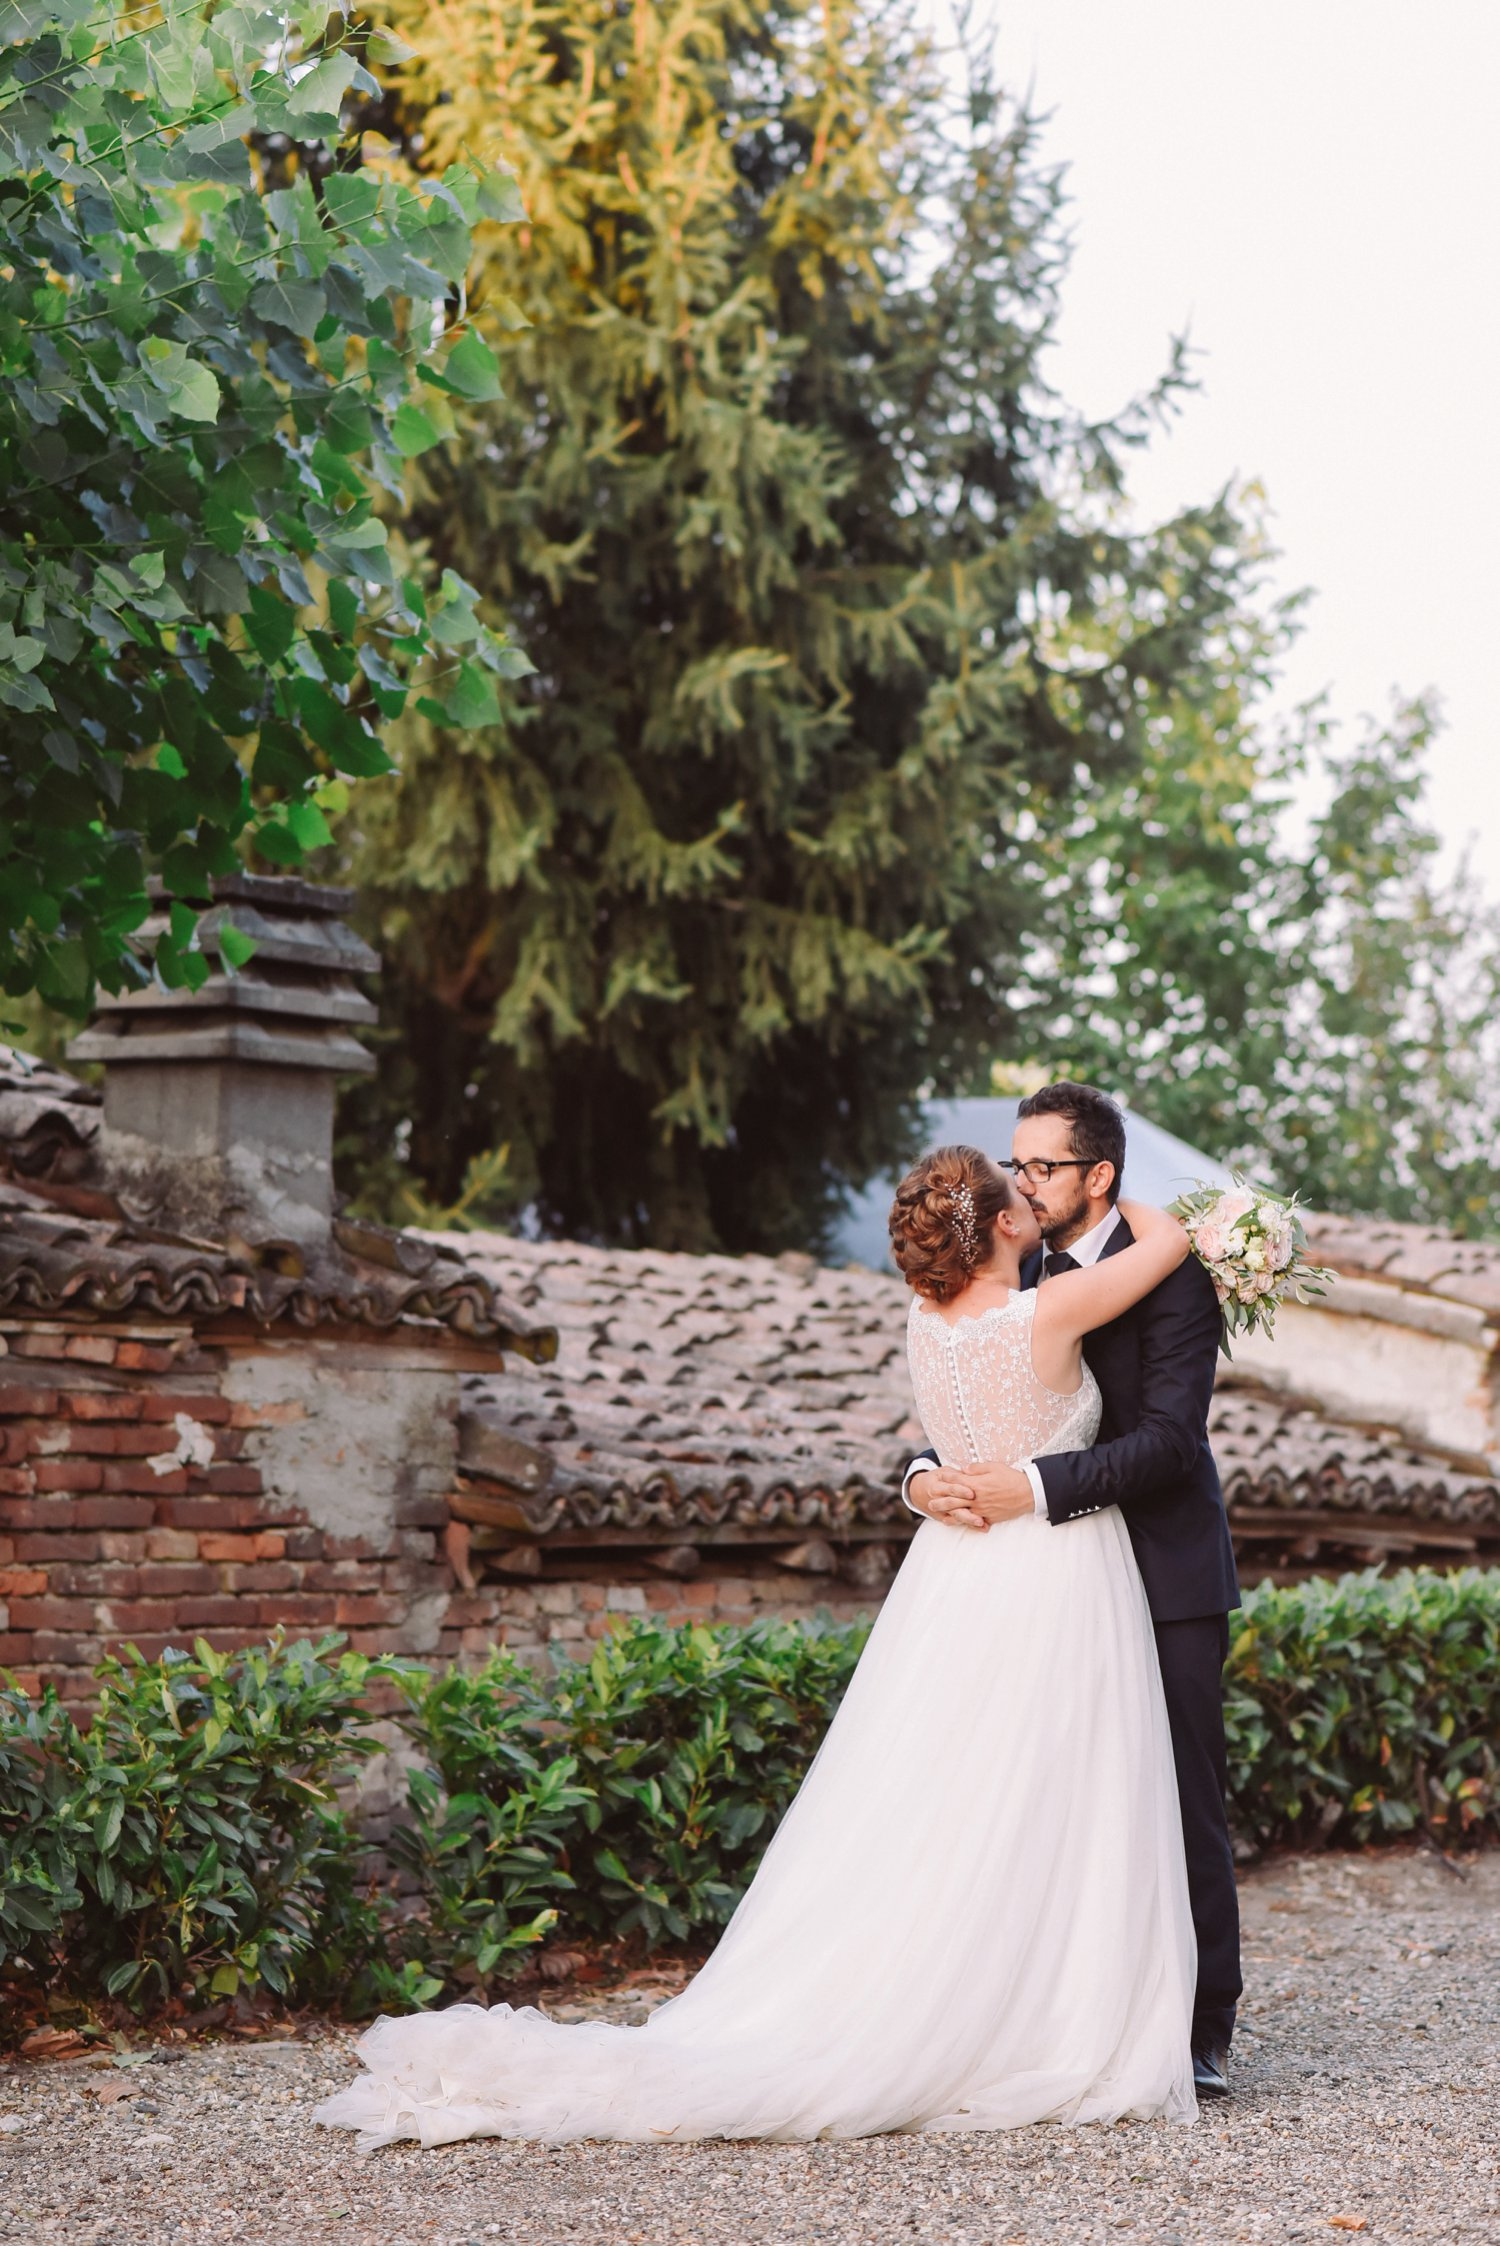 servizio-matrimonio-tortona-alessandria_0020.jpg